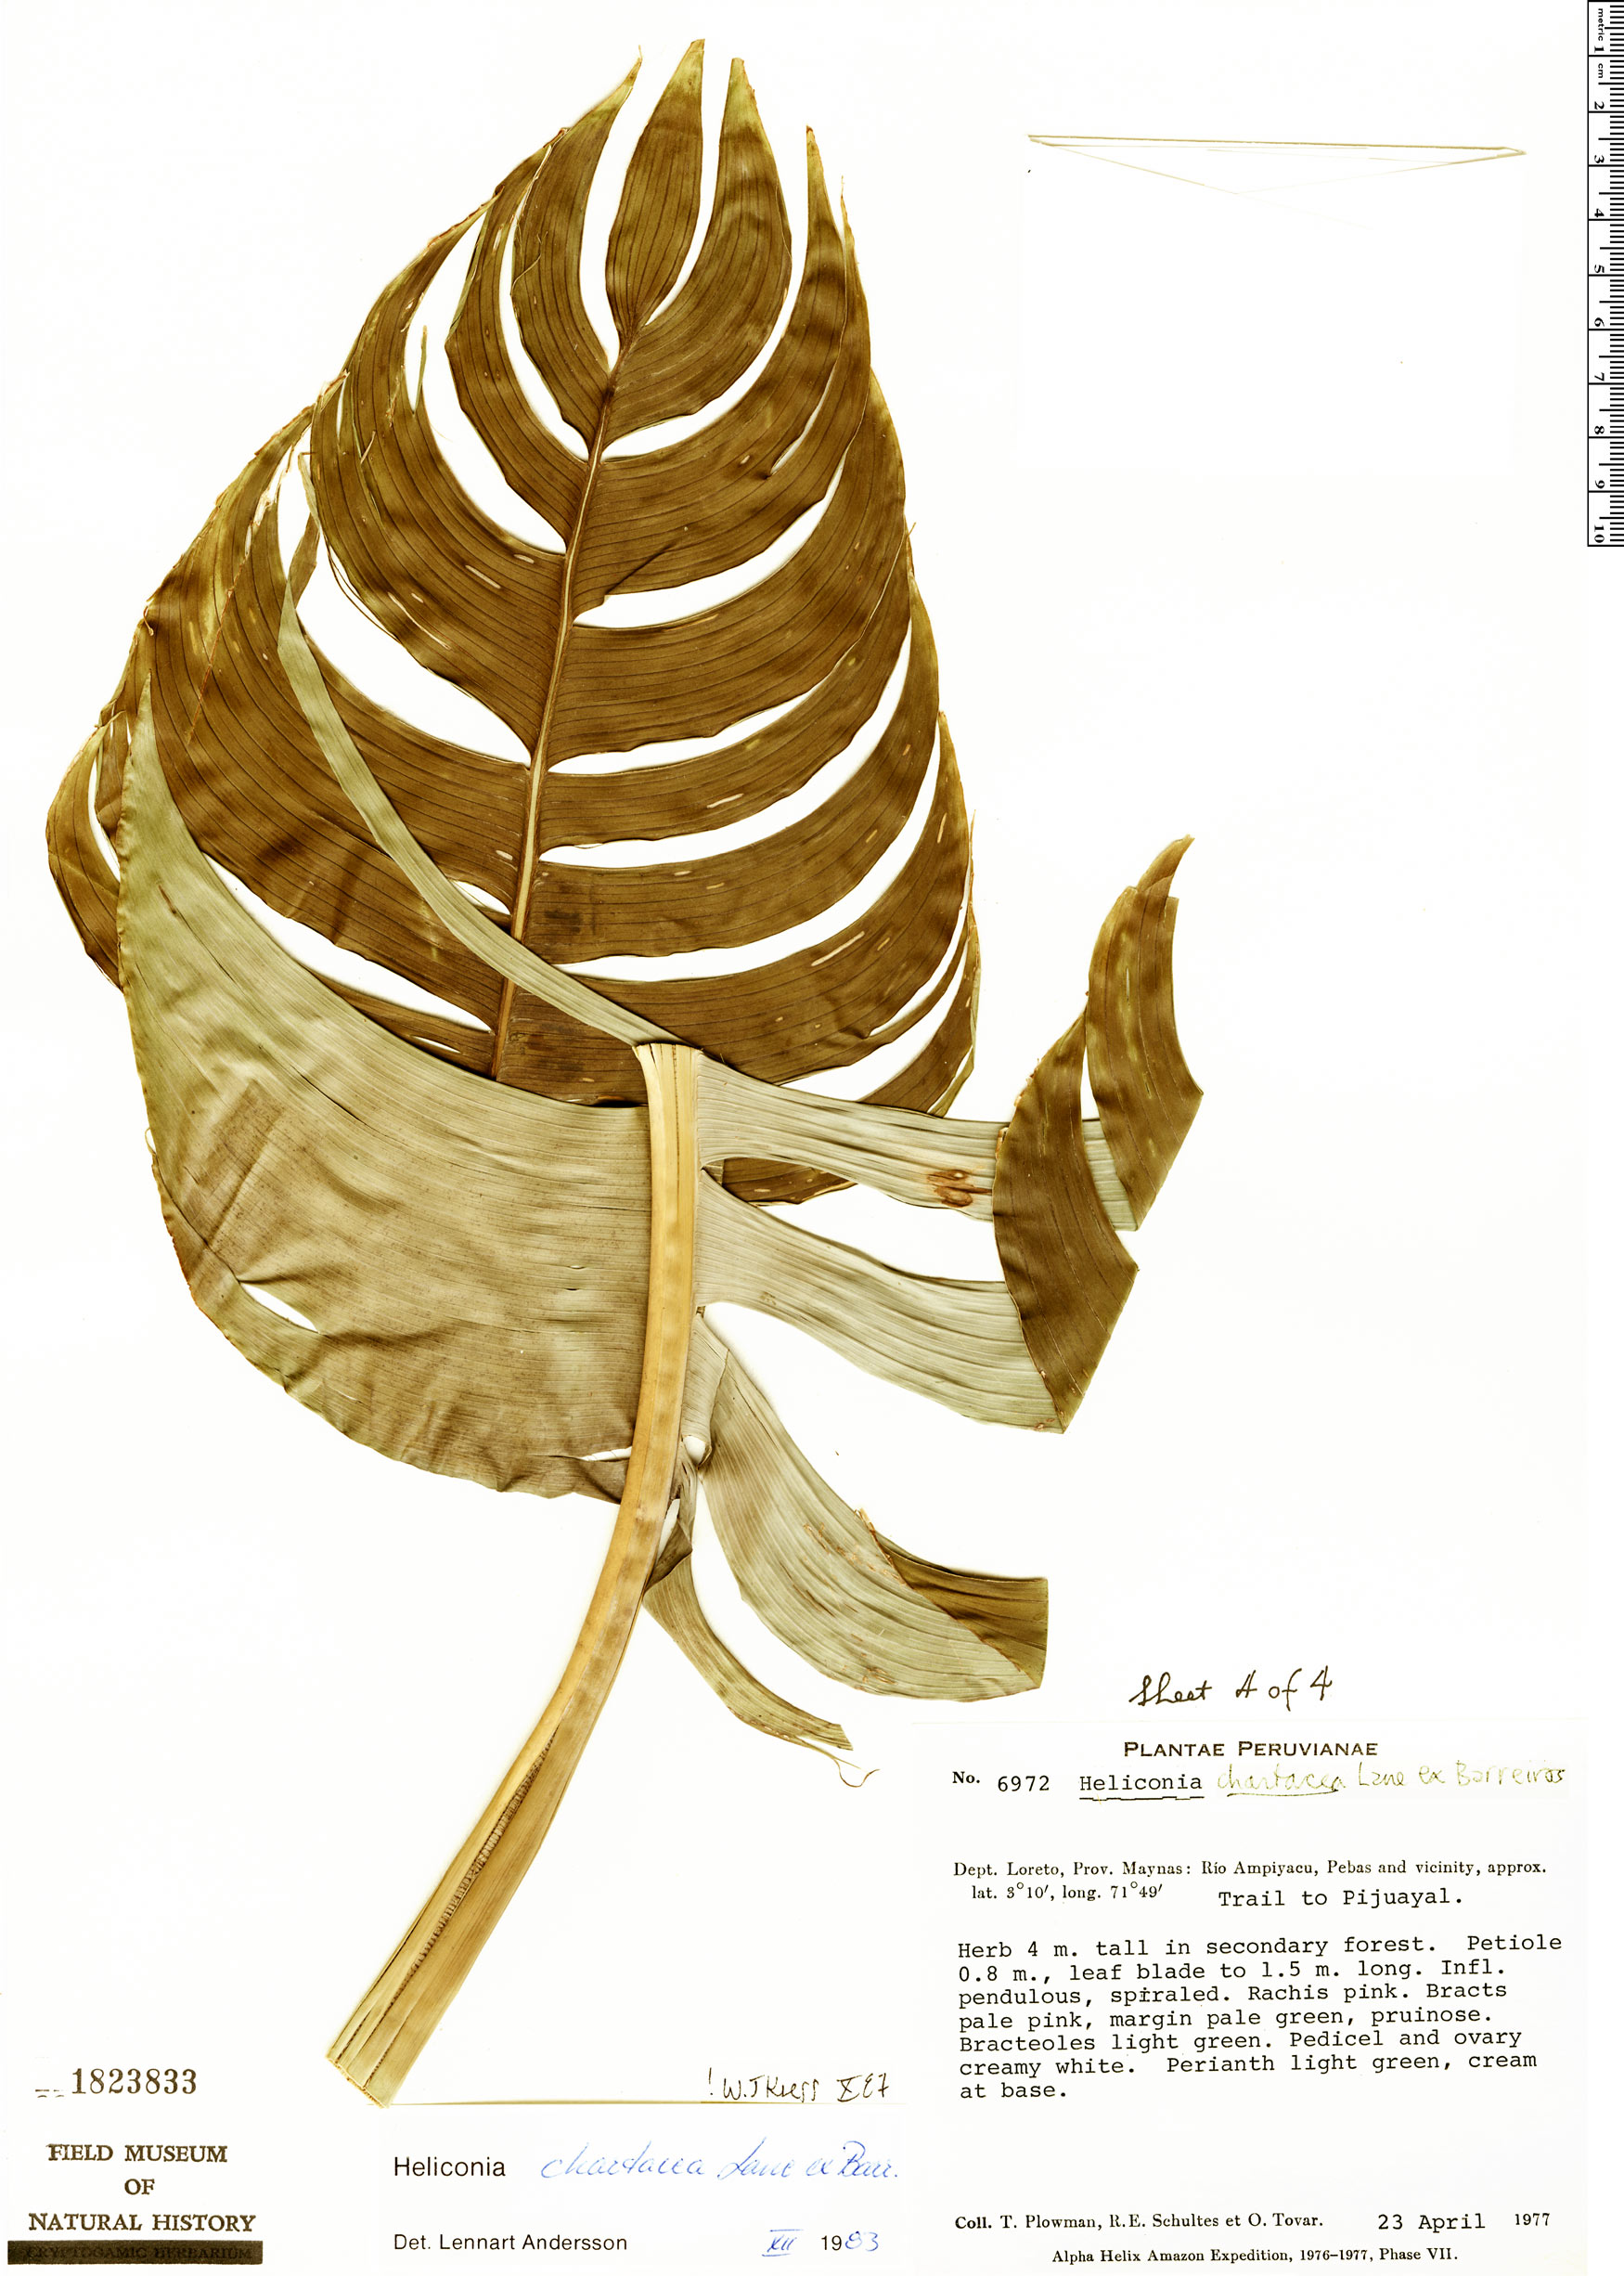 Specimen: Heliconia chartacea